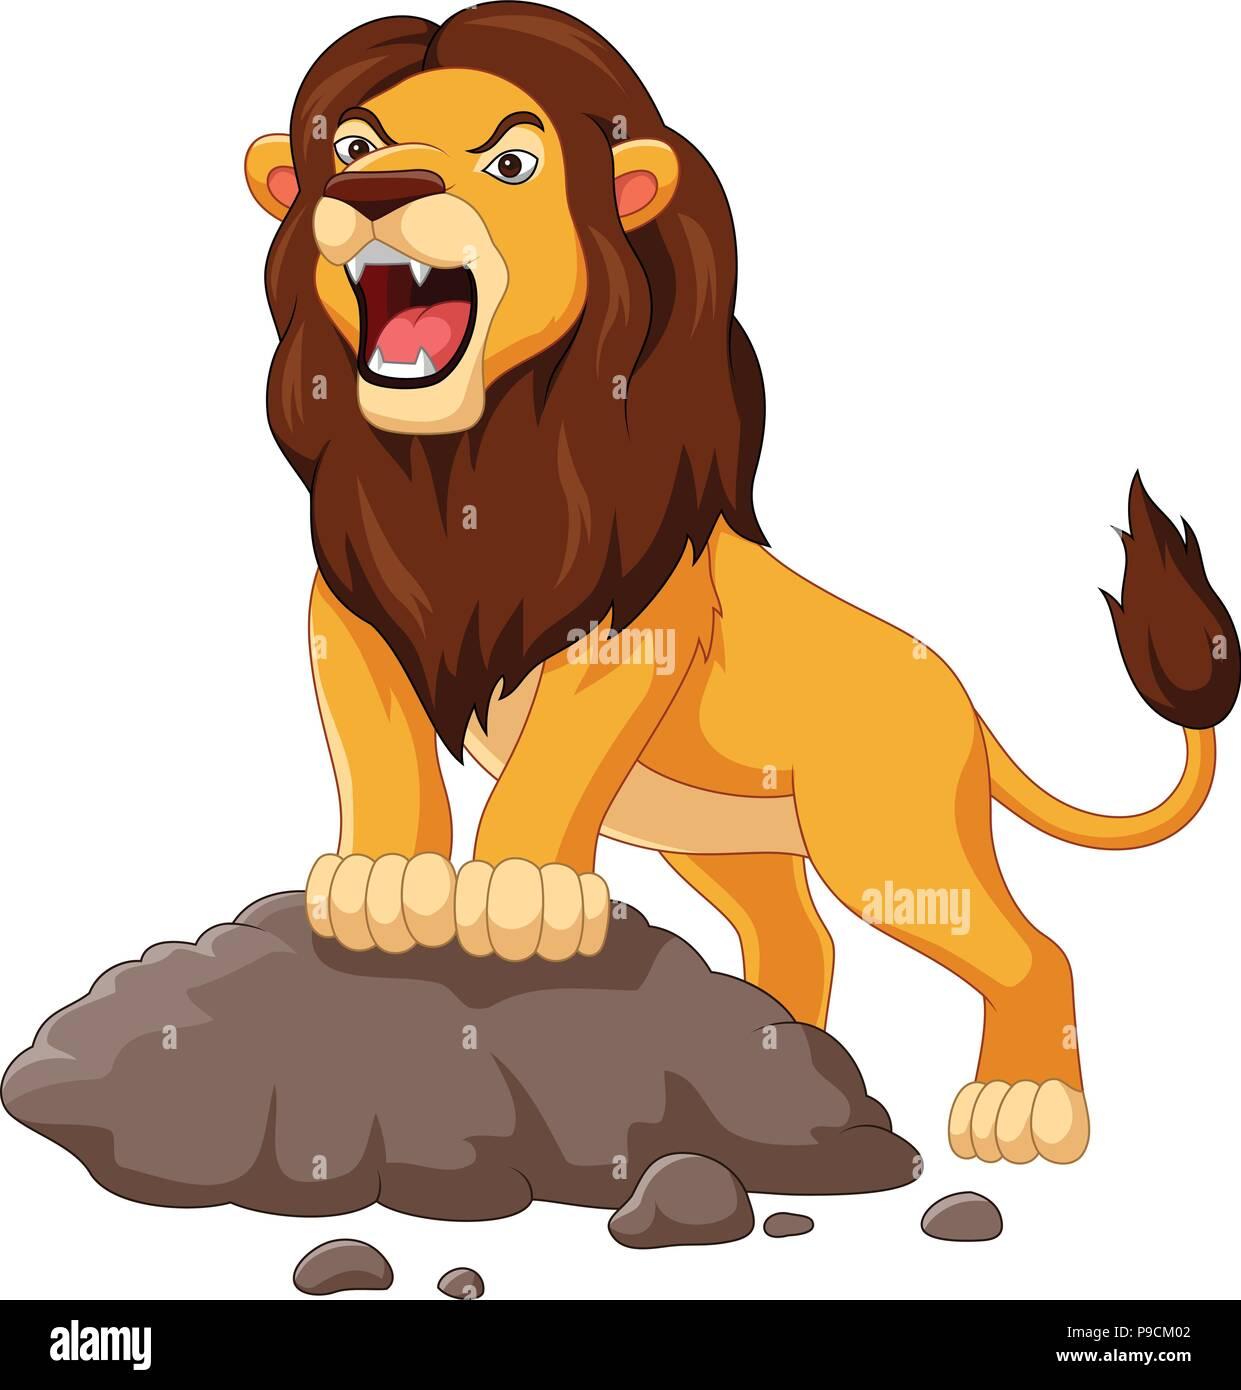 Cartoon Lion Roaring Isolated On White Background Stock Vector Image Art Alamy